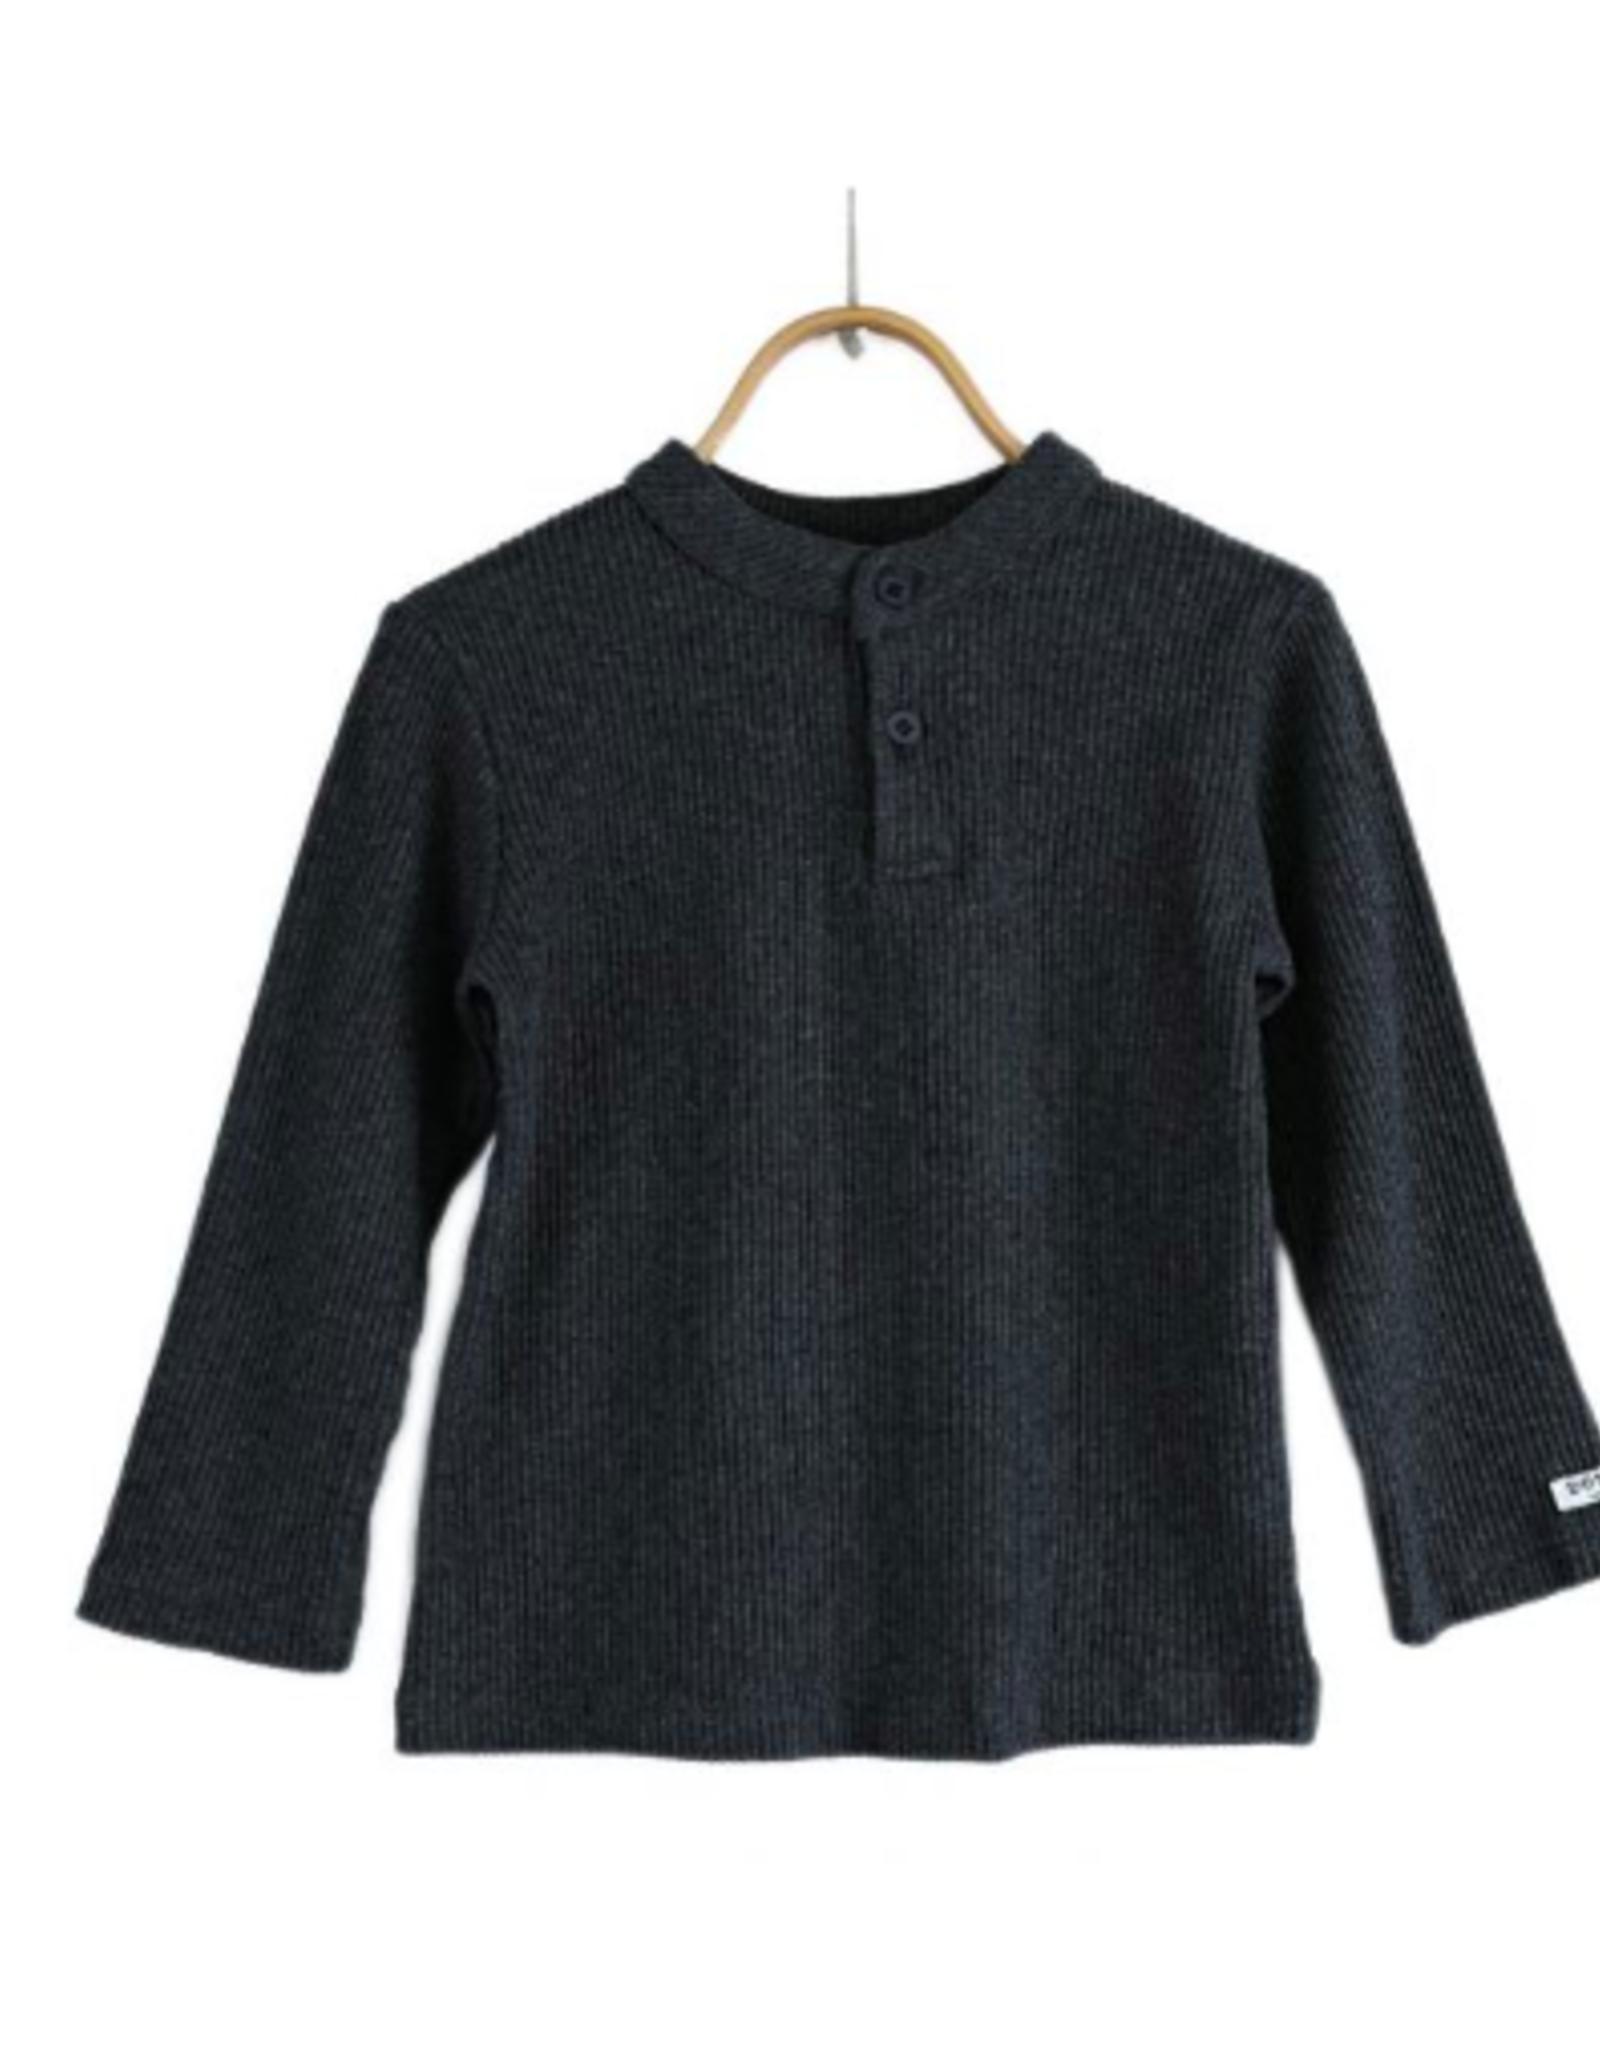 Pip sweater